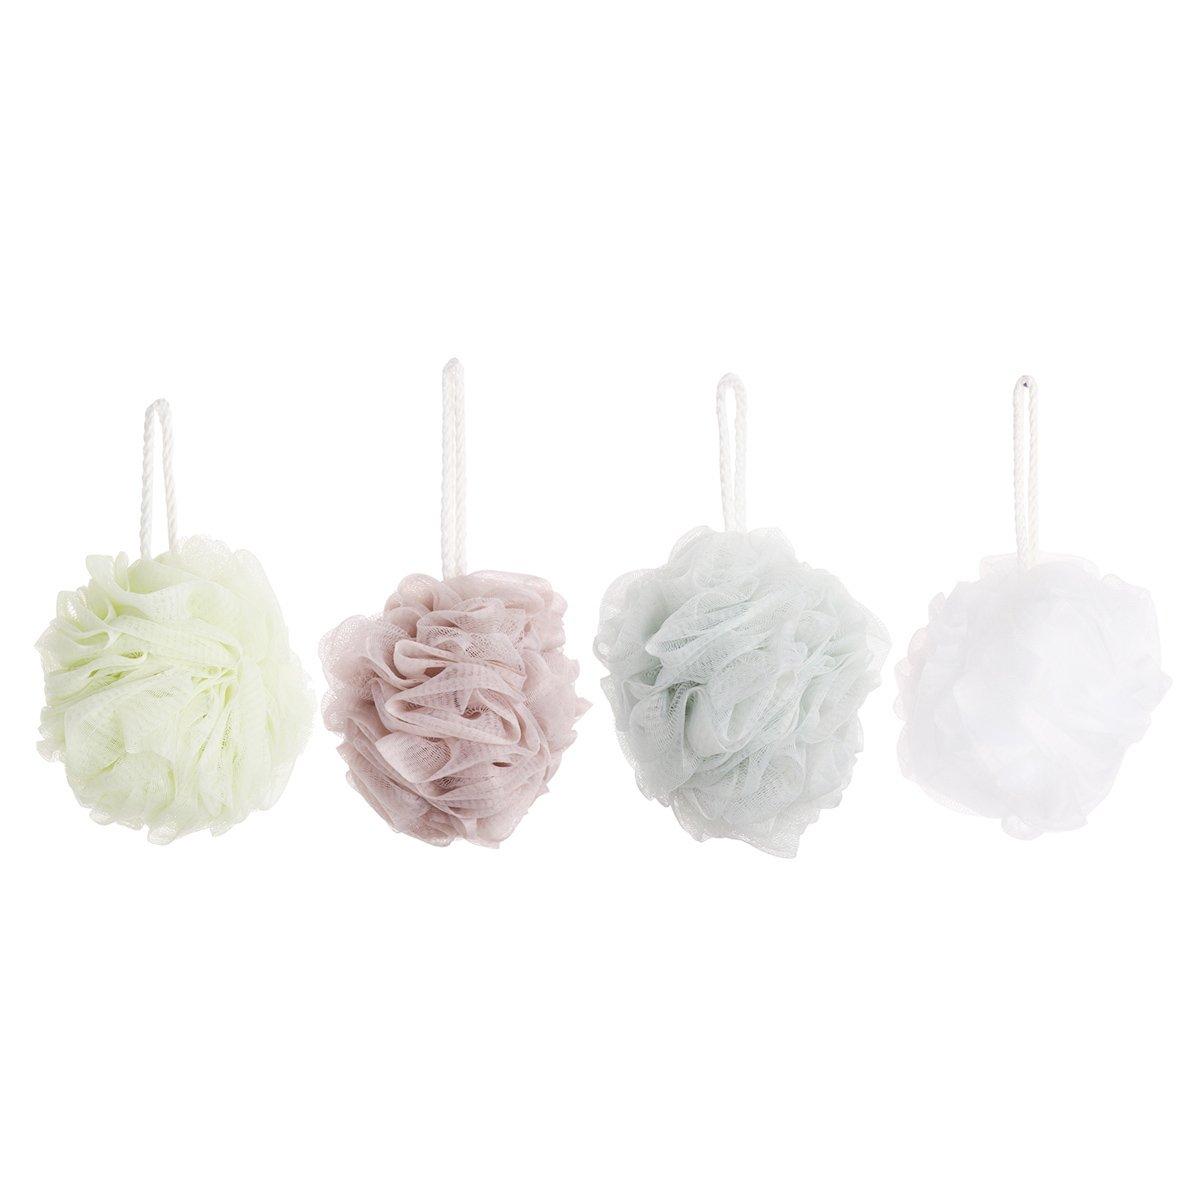 Freebily 4pcs Large Eco-friendly Exfoliating Mesh Brush Bath Ball Pouf Loofahs Bubble Shower Sponge for Men Women